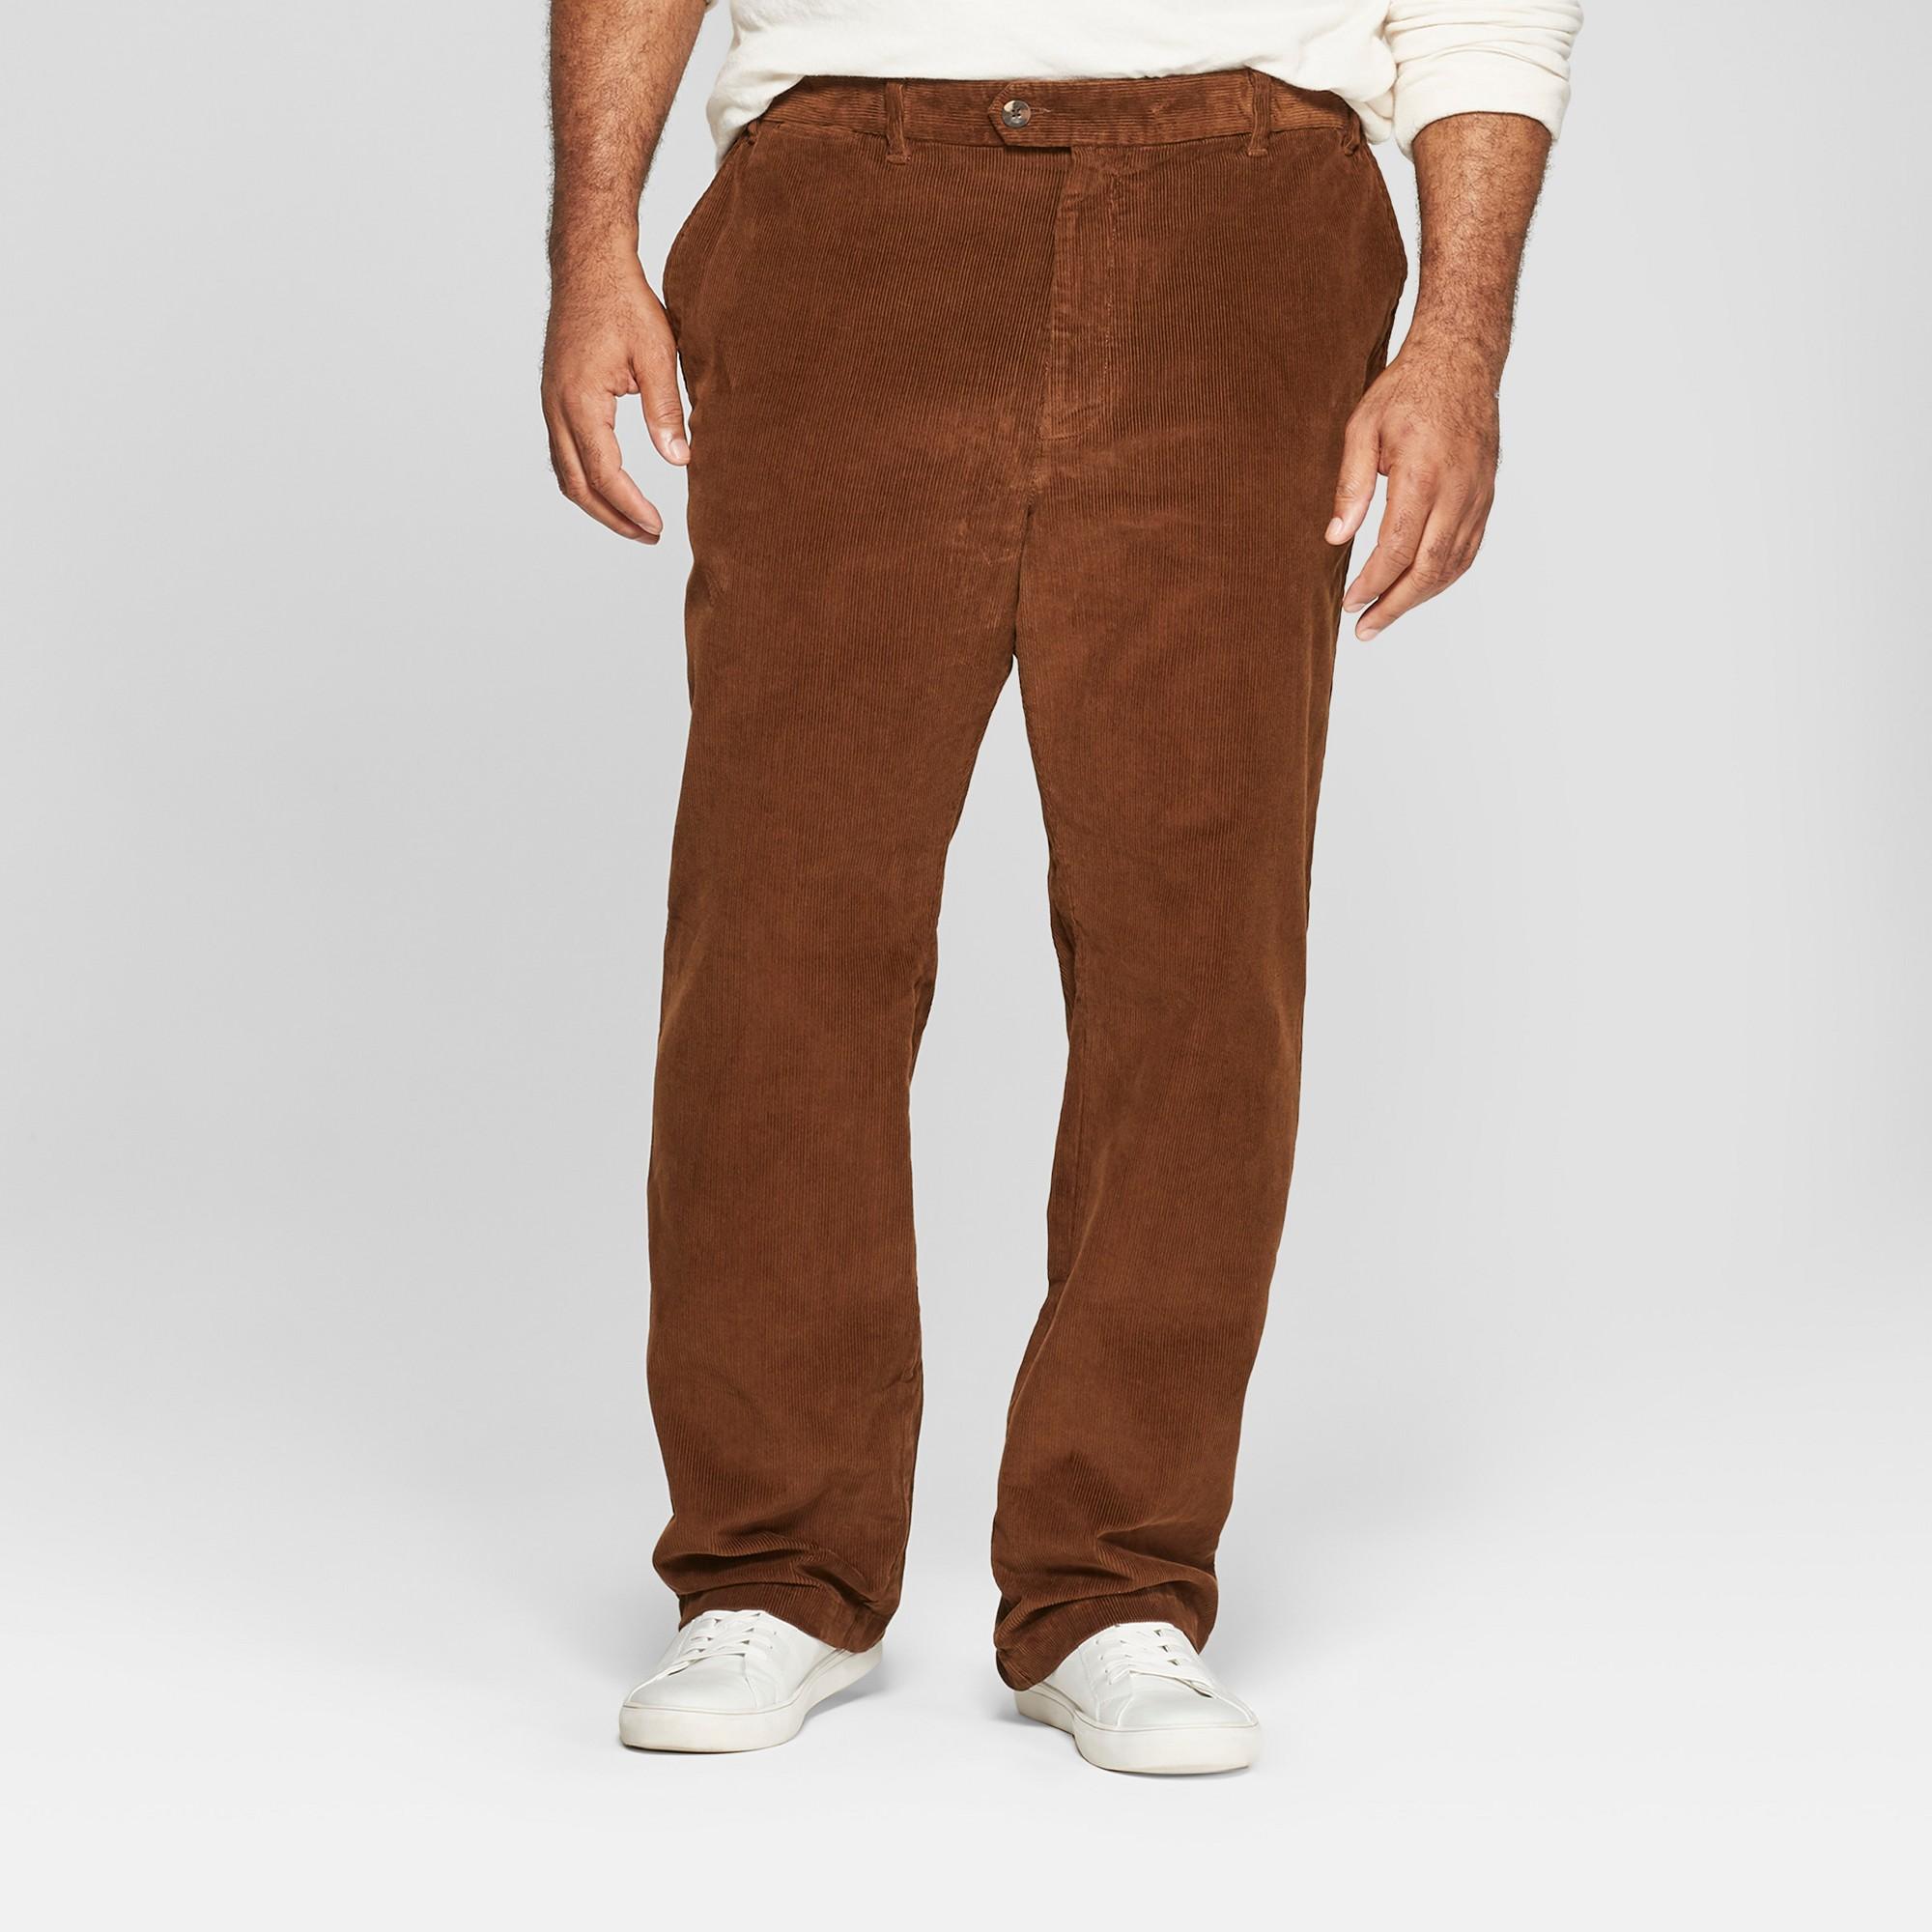 Men's Big & Tall Straight Fit Corduroy Trouser - Goodfellow & Co Stick Brown 46x36